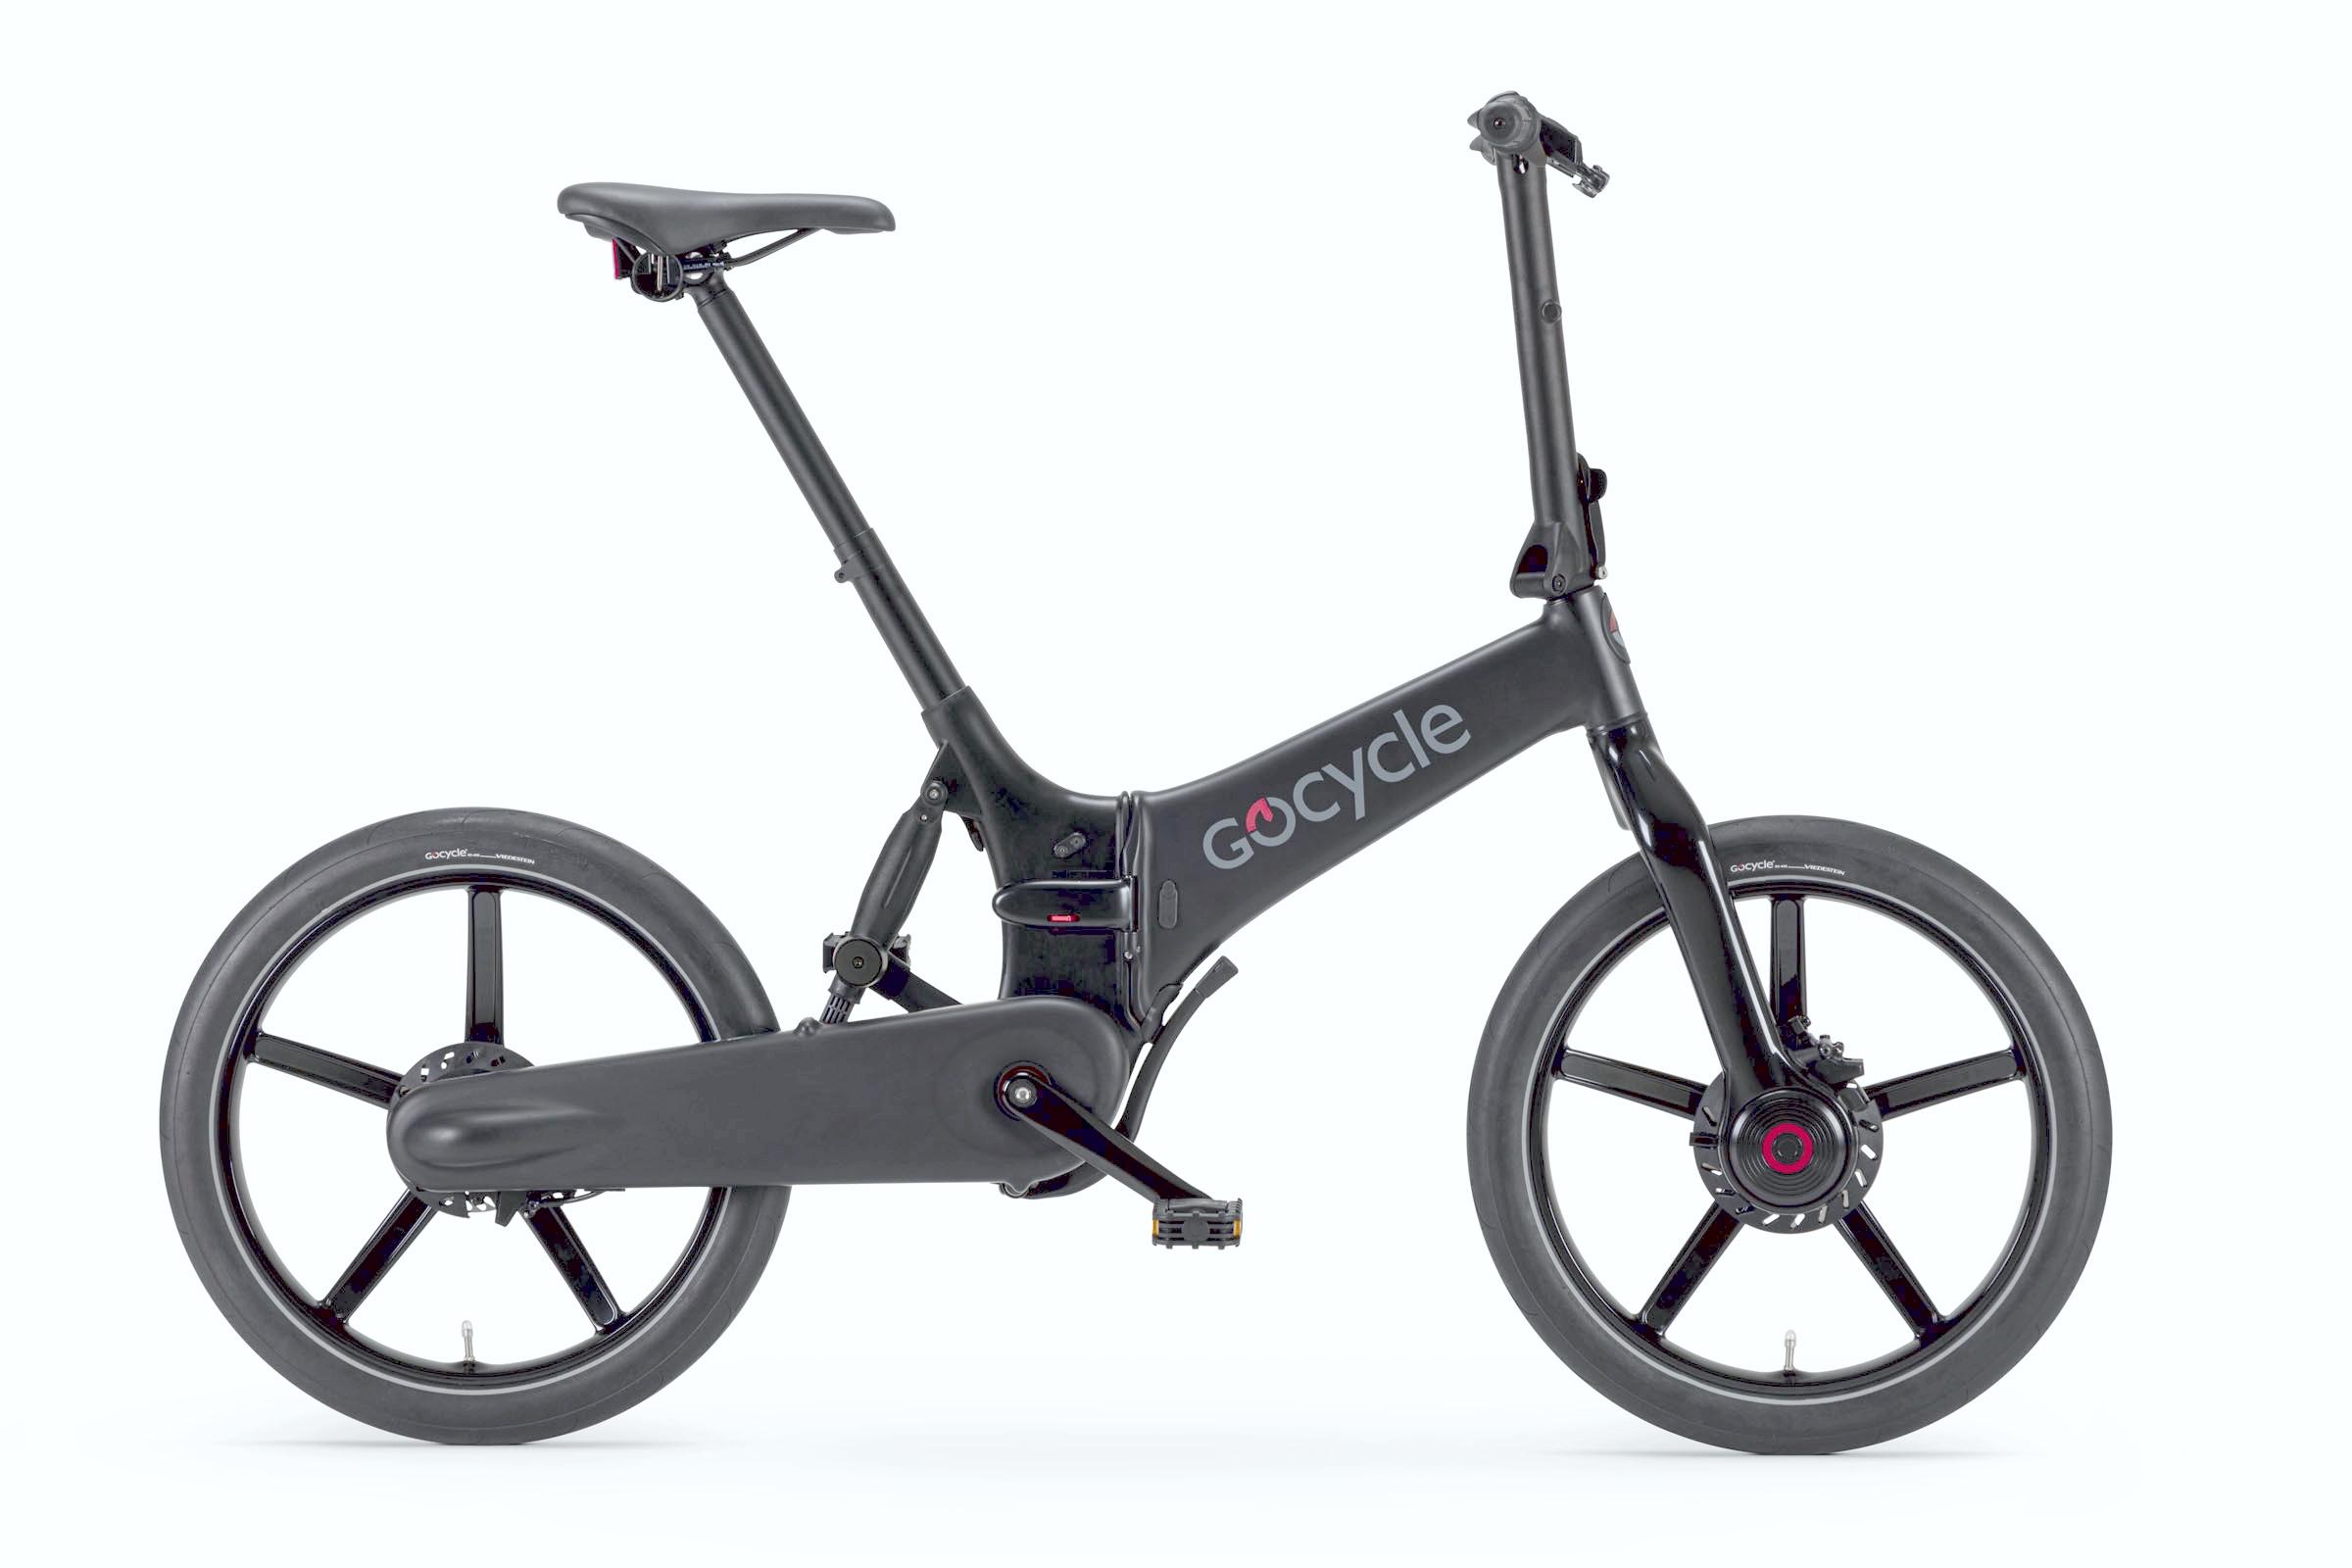 Gocycle G4 črna mat barva